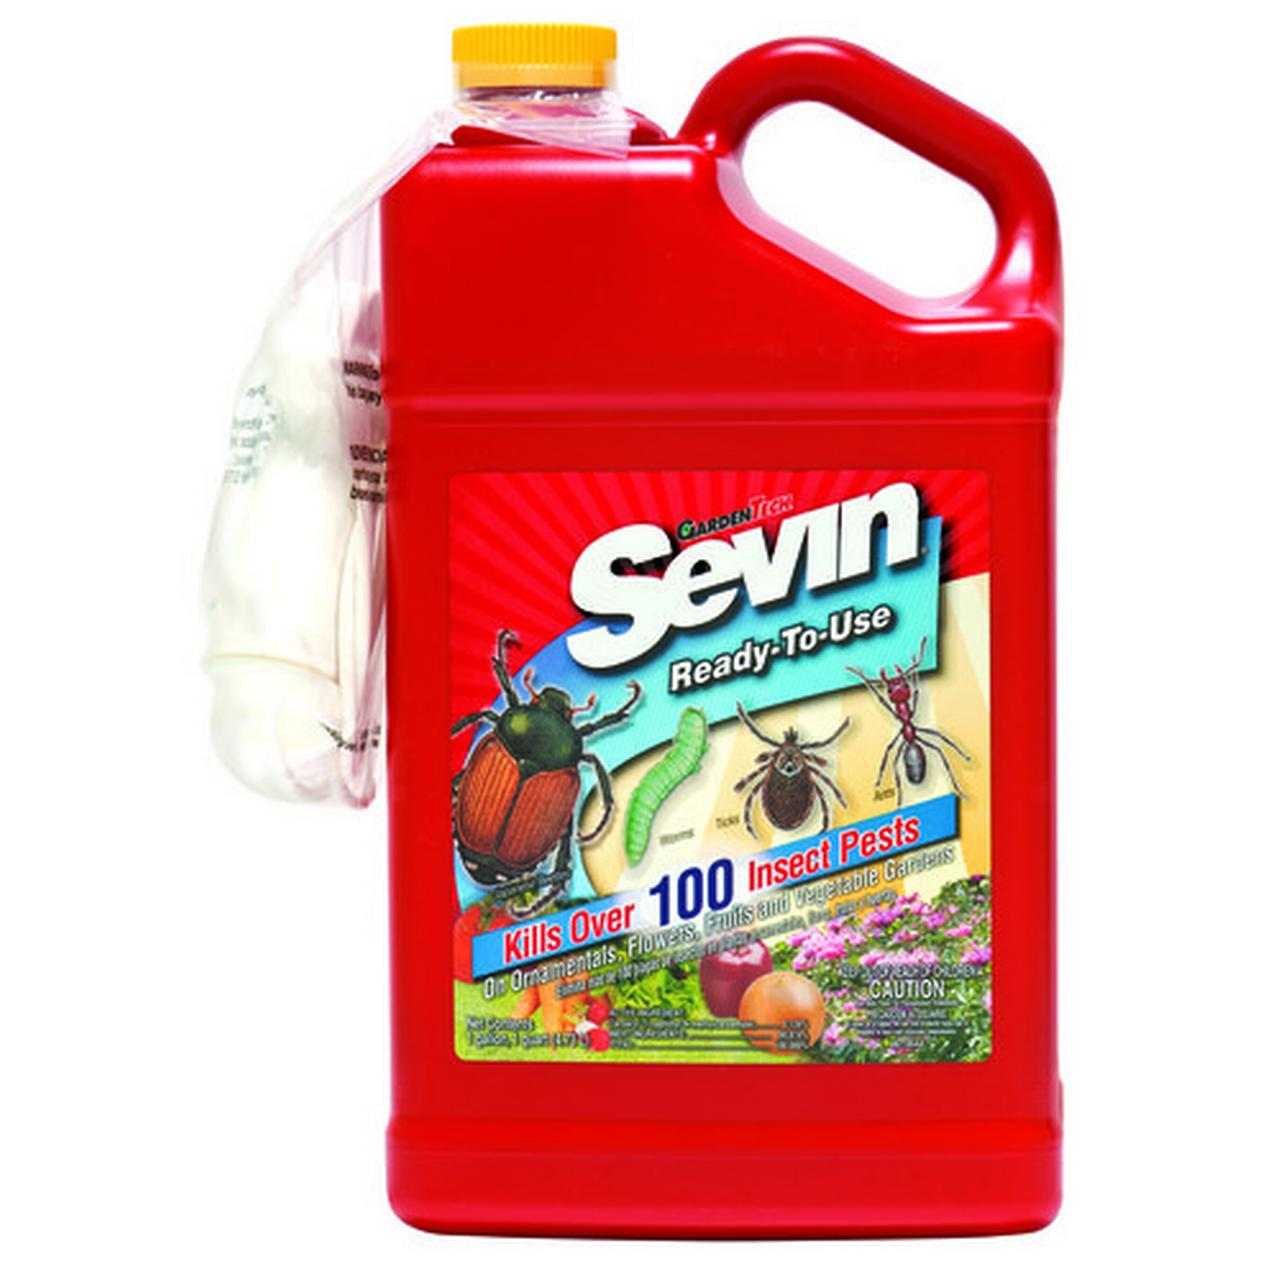 Gardentech Sevin Rtu Bug Killer